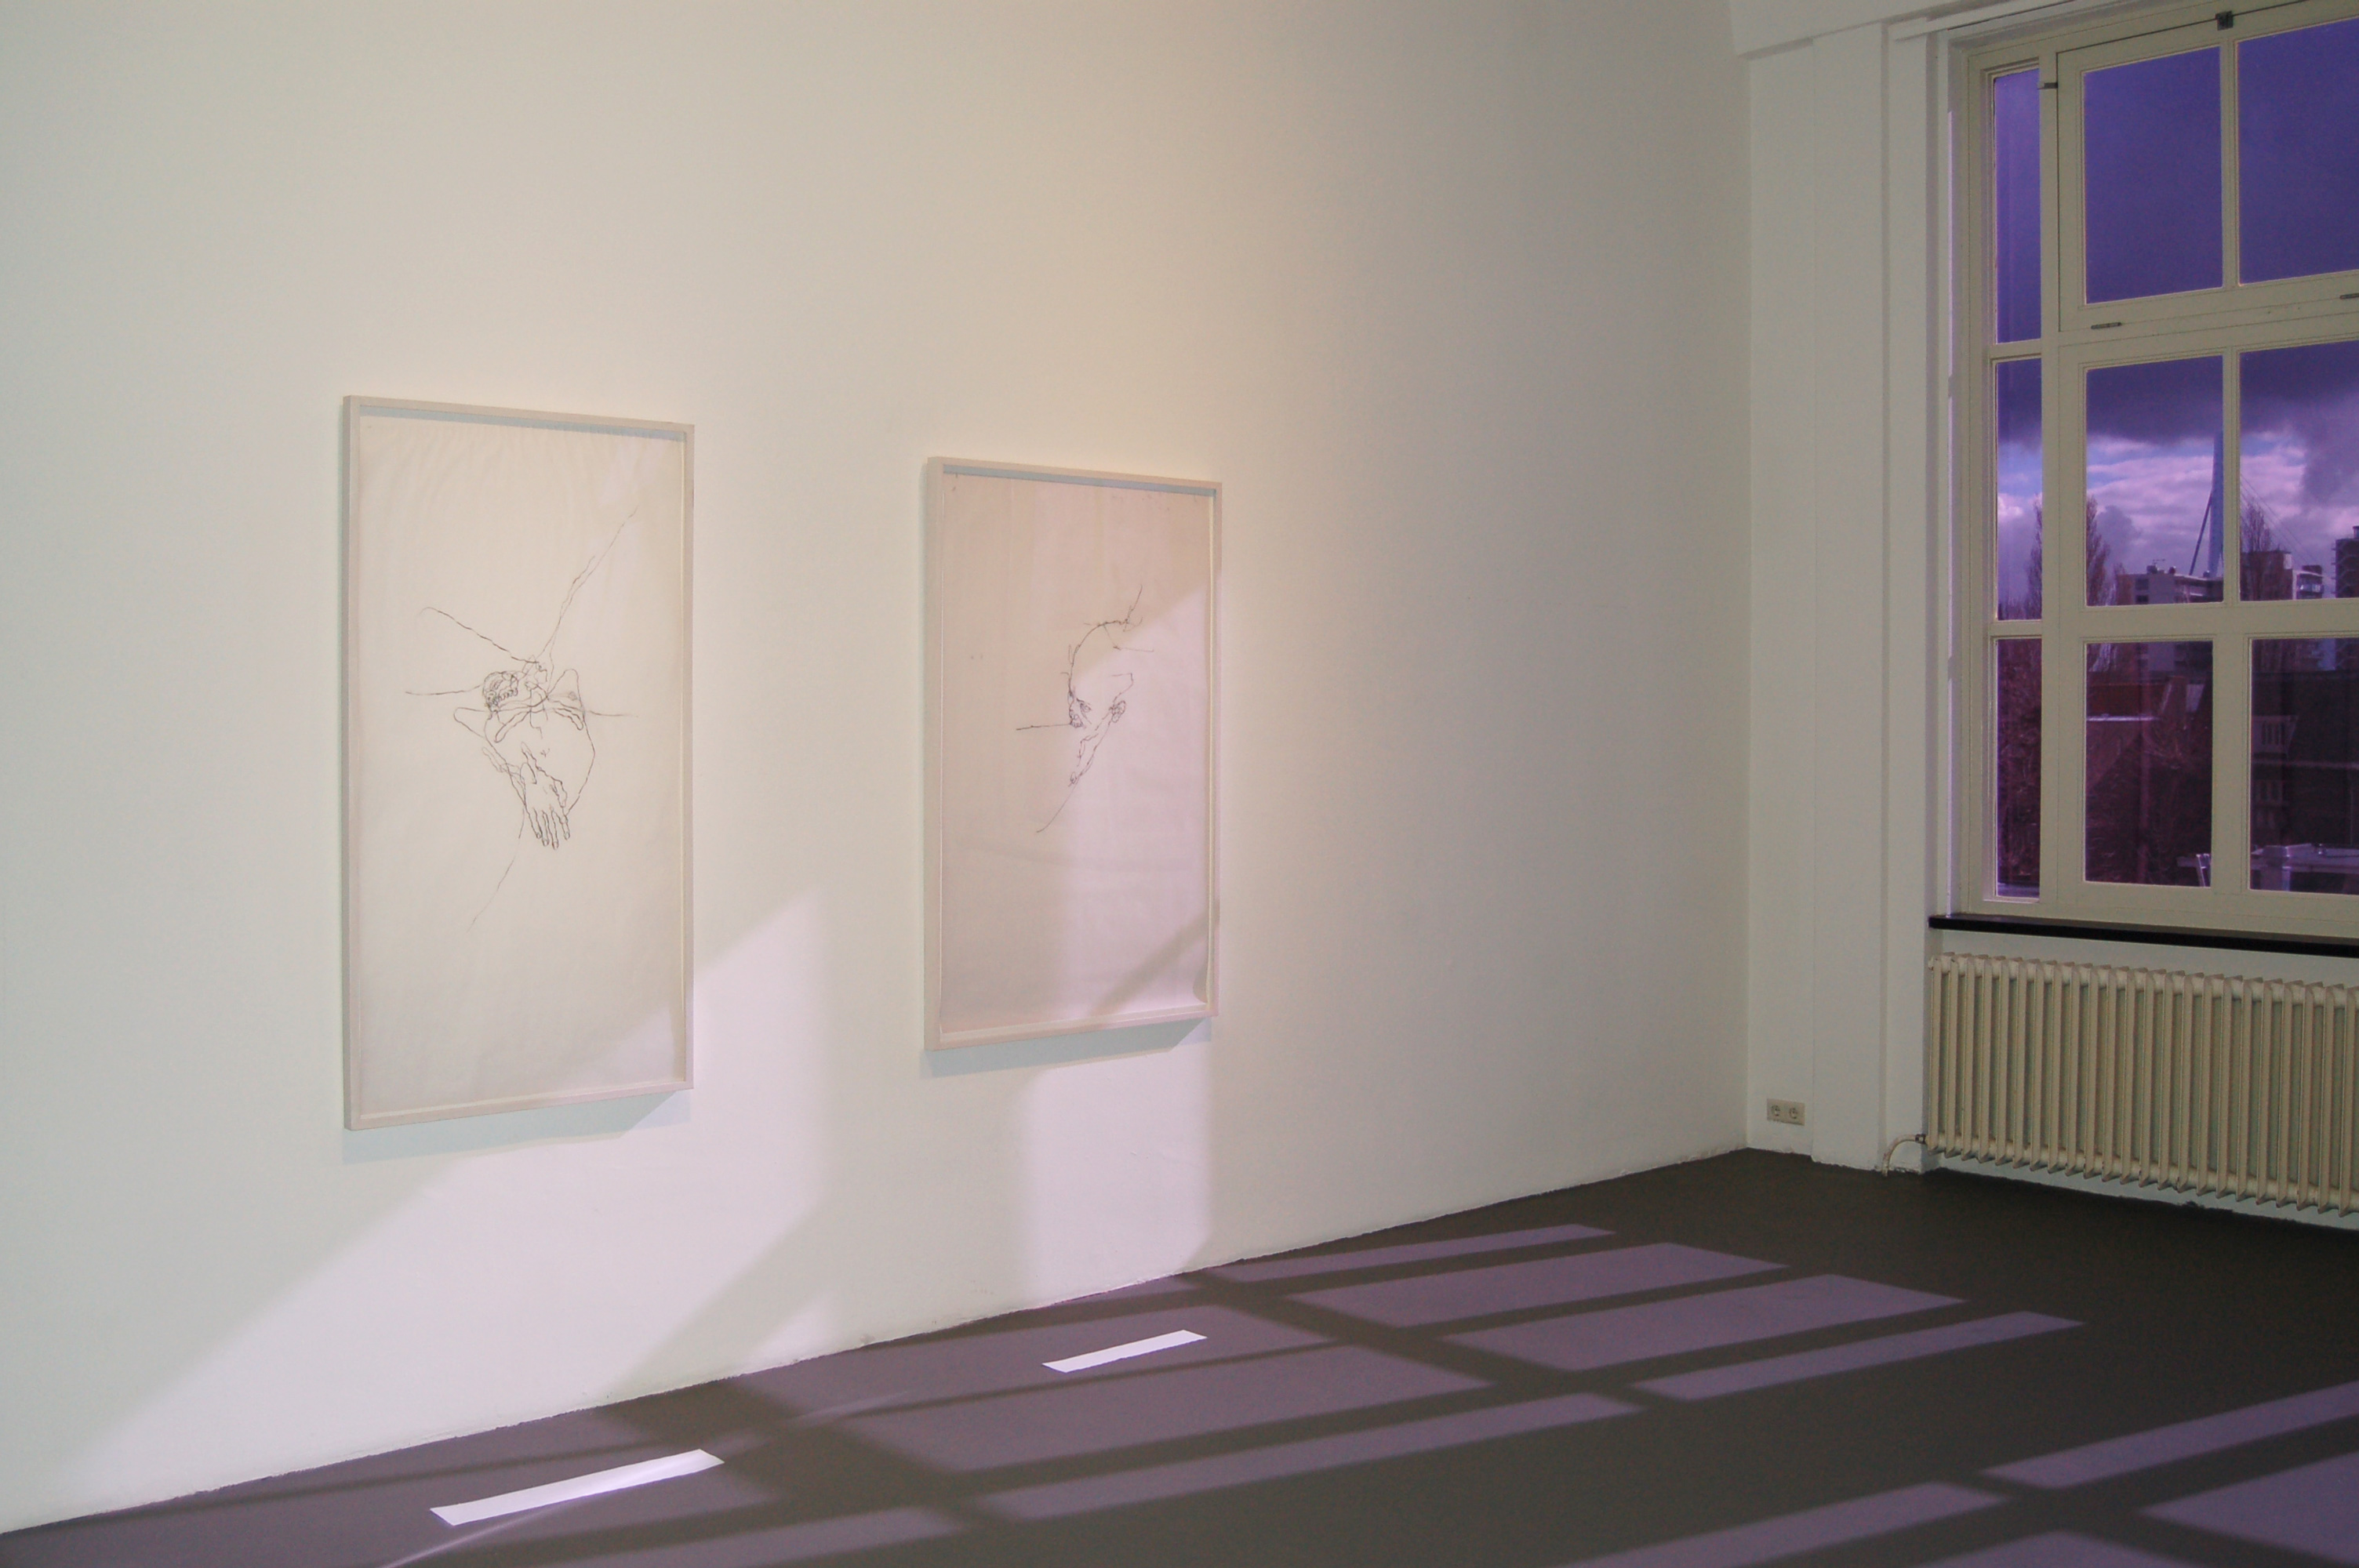 Galerie Barbara Thumm \ Chloe Piene – Solo Exhibition